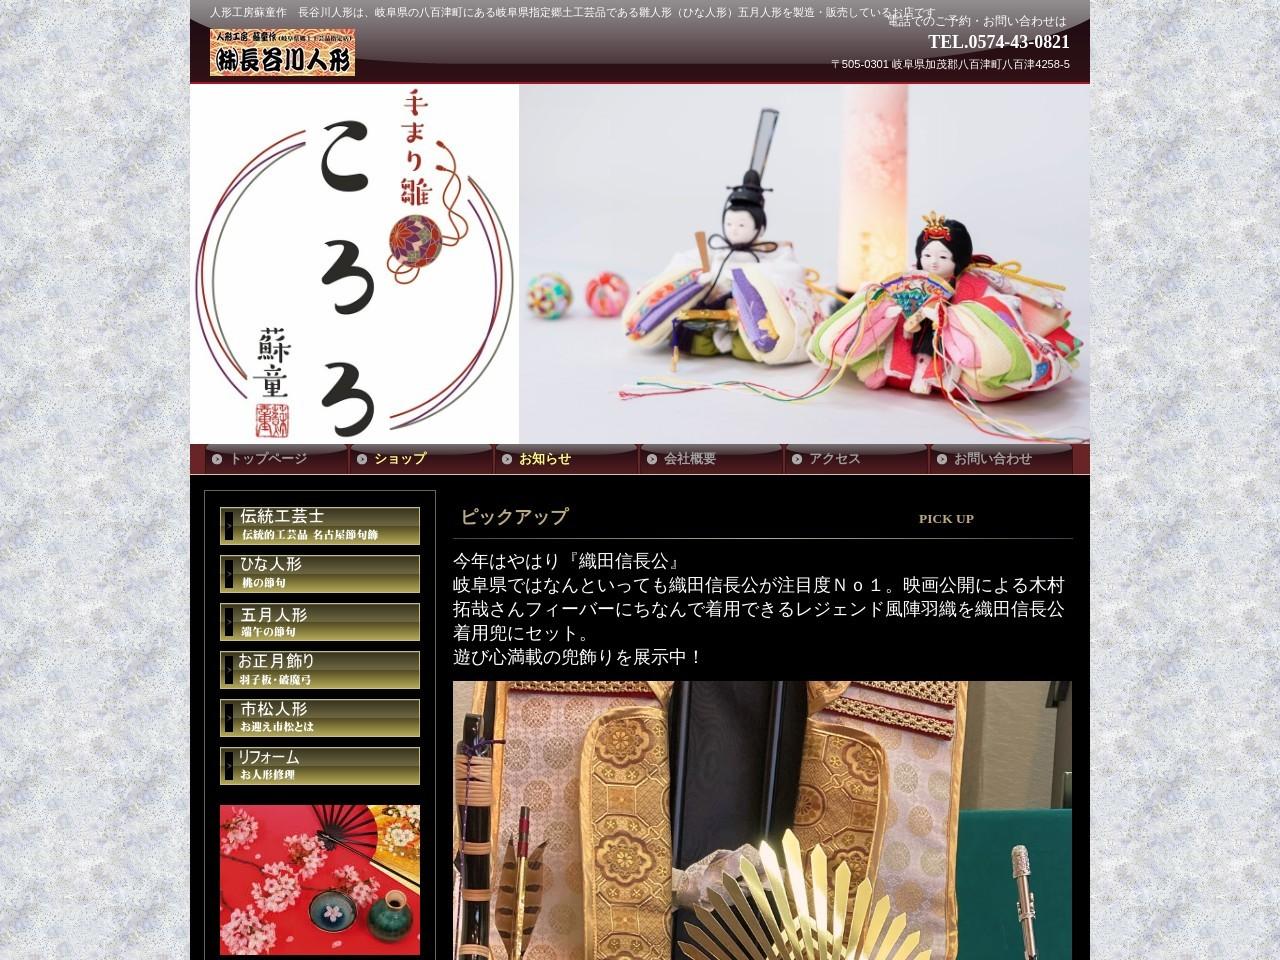 株式会社 長谷川人形|蘇童作の雛人形(ひな人形) ・五月人形|岐阜 八百津|